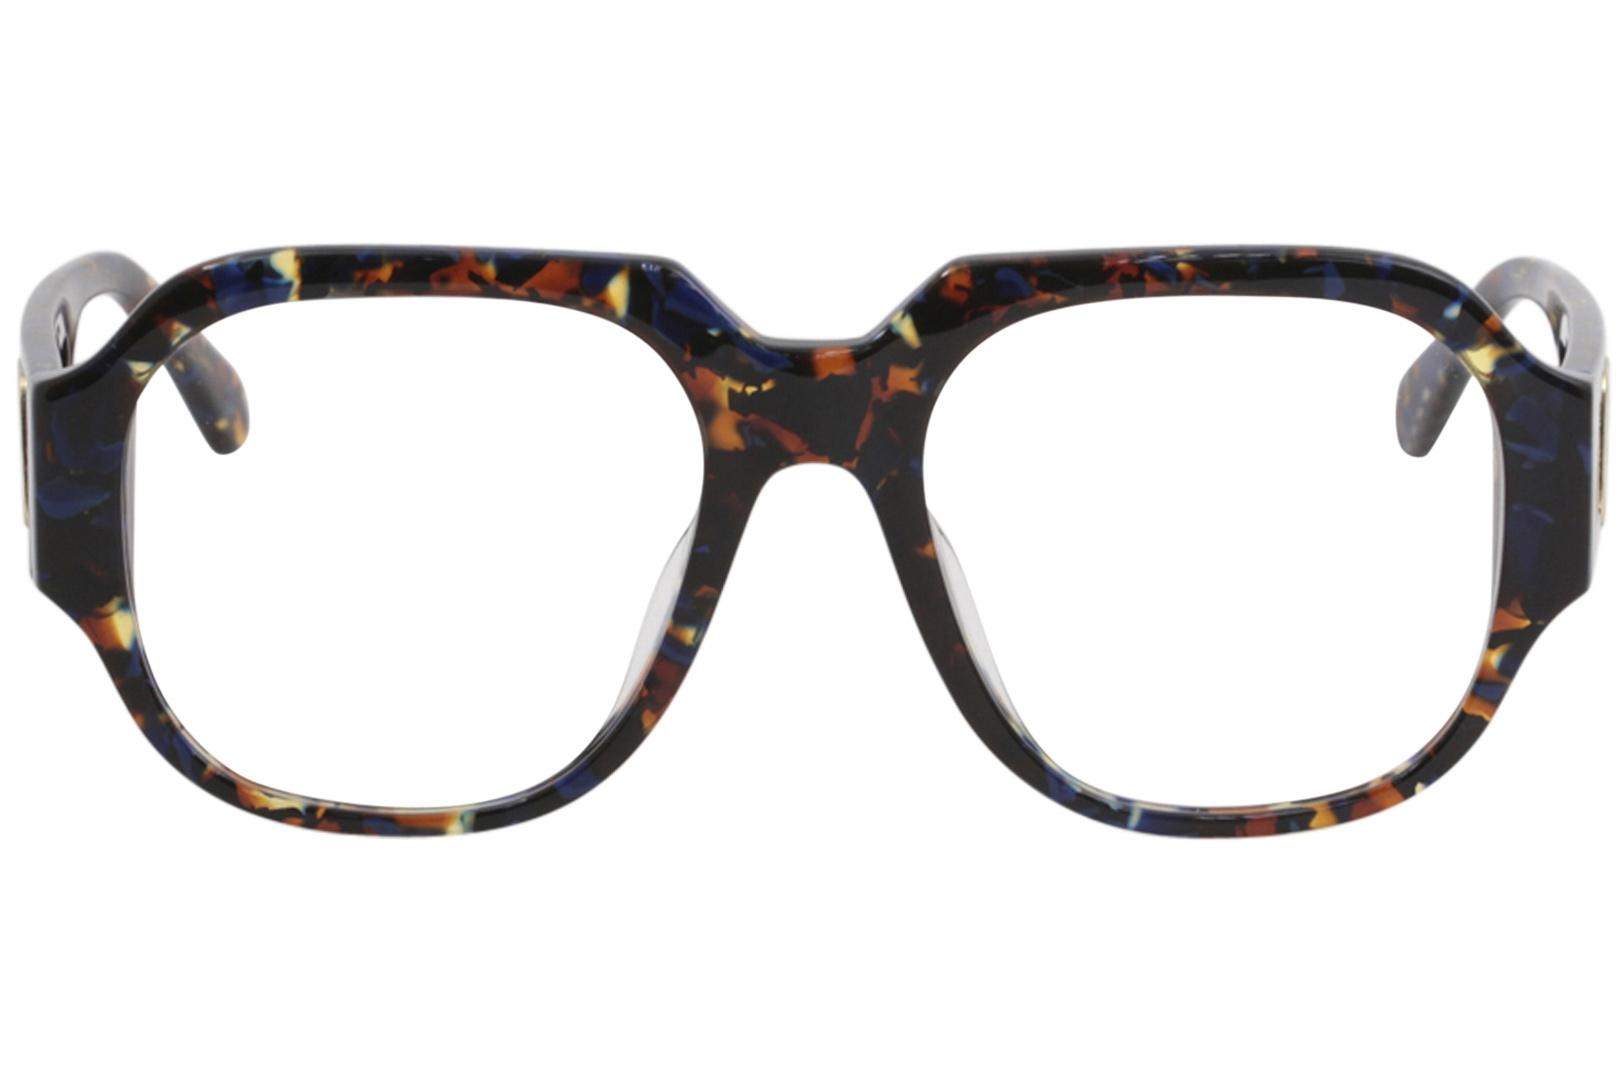 75fae517310 MCM Women s Eyeglasses MCM2663A MCM 2663 A Full Rim Optical Frame by MCM.  12345